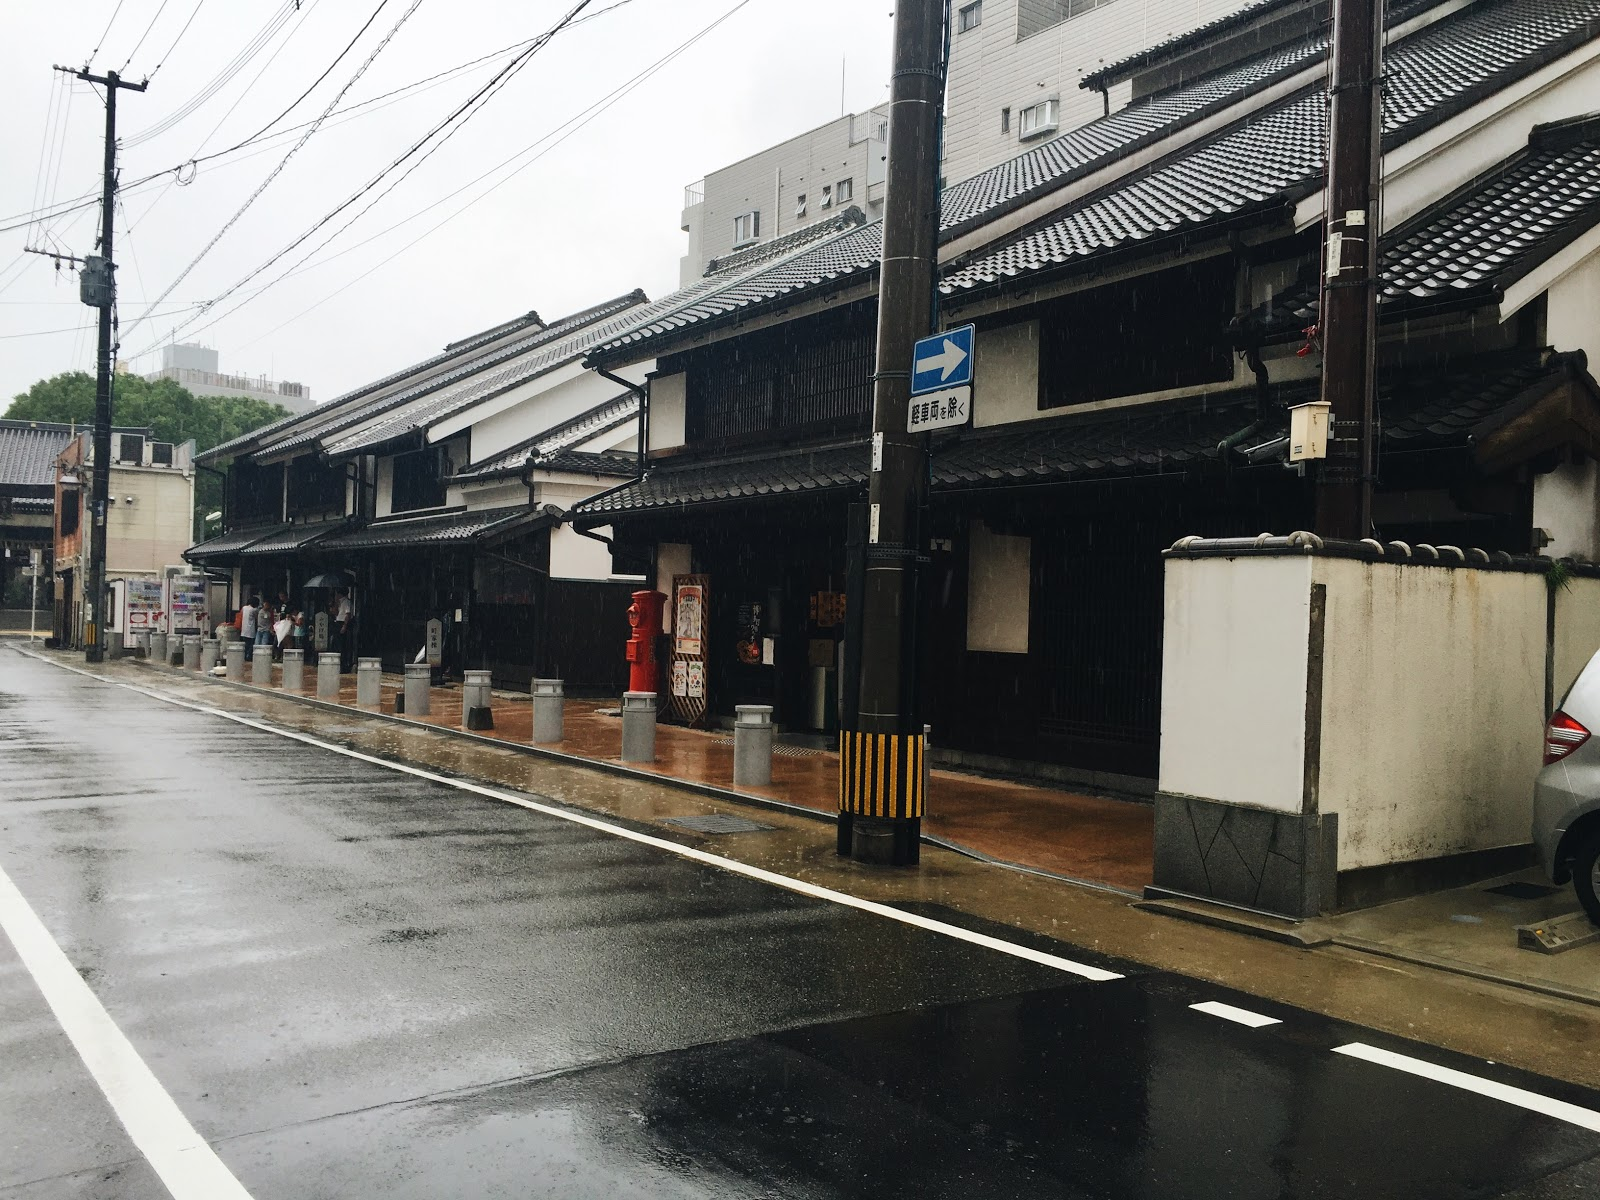 With Love from Japan, Eustacia: Hakata Machiya Folk Museum